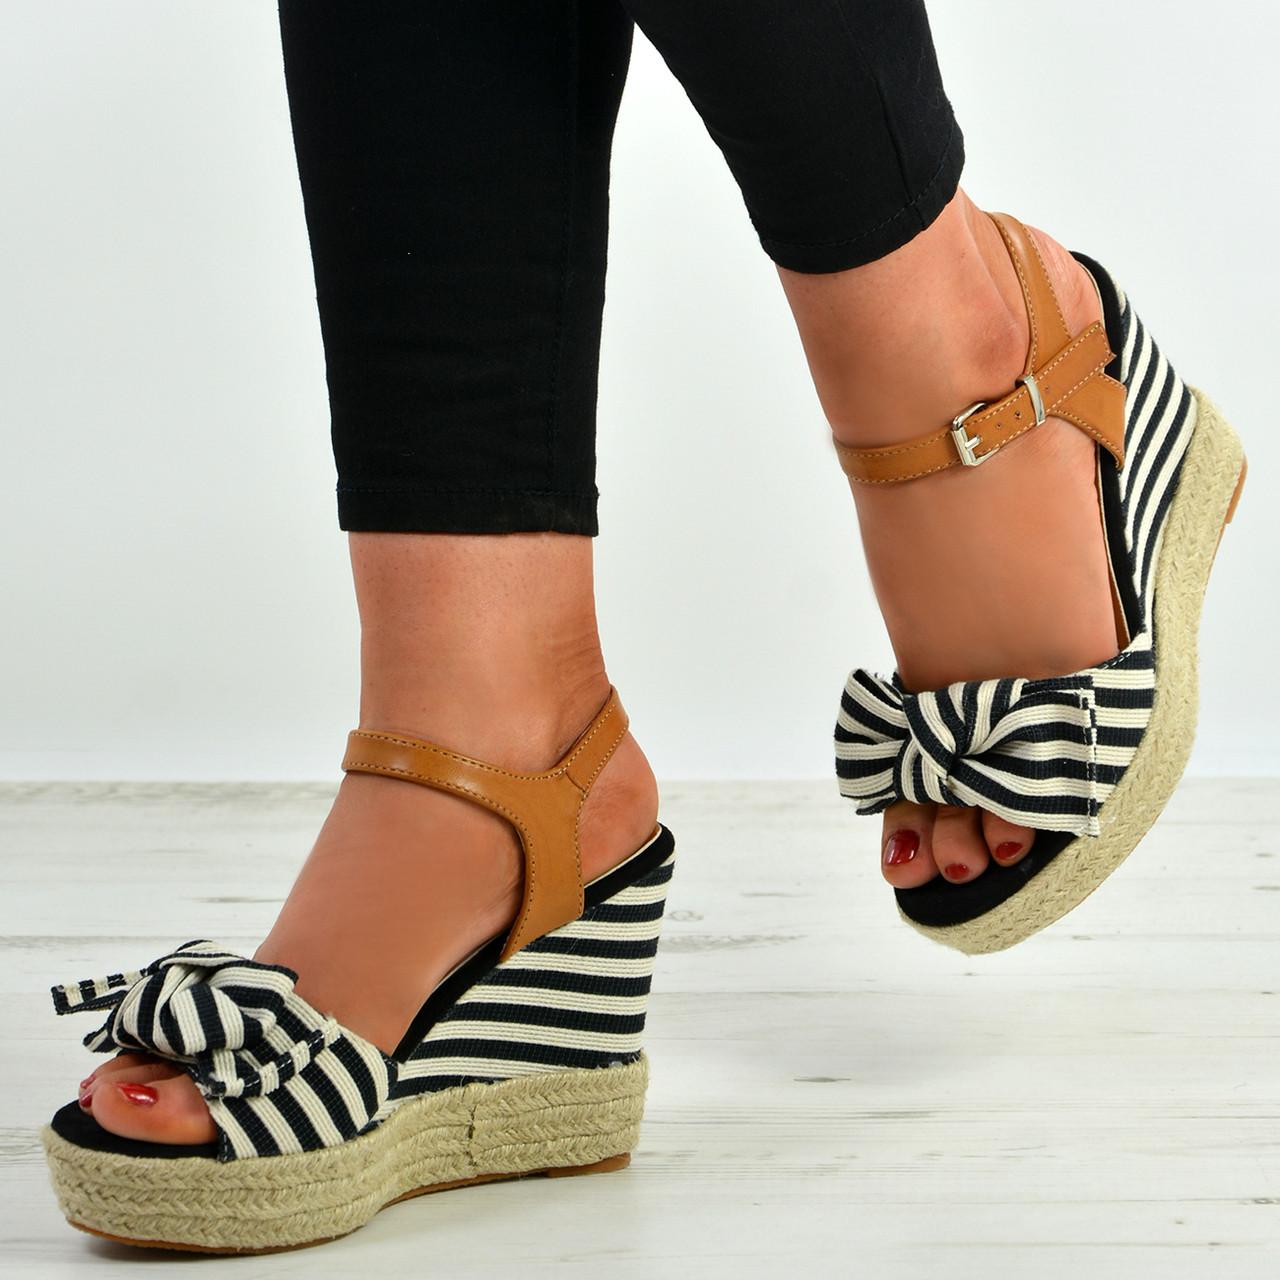 Bow Ankle Platform Womens Heels Espadrille High Strap New Wedges 4jL3AR5cqS